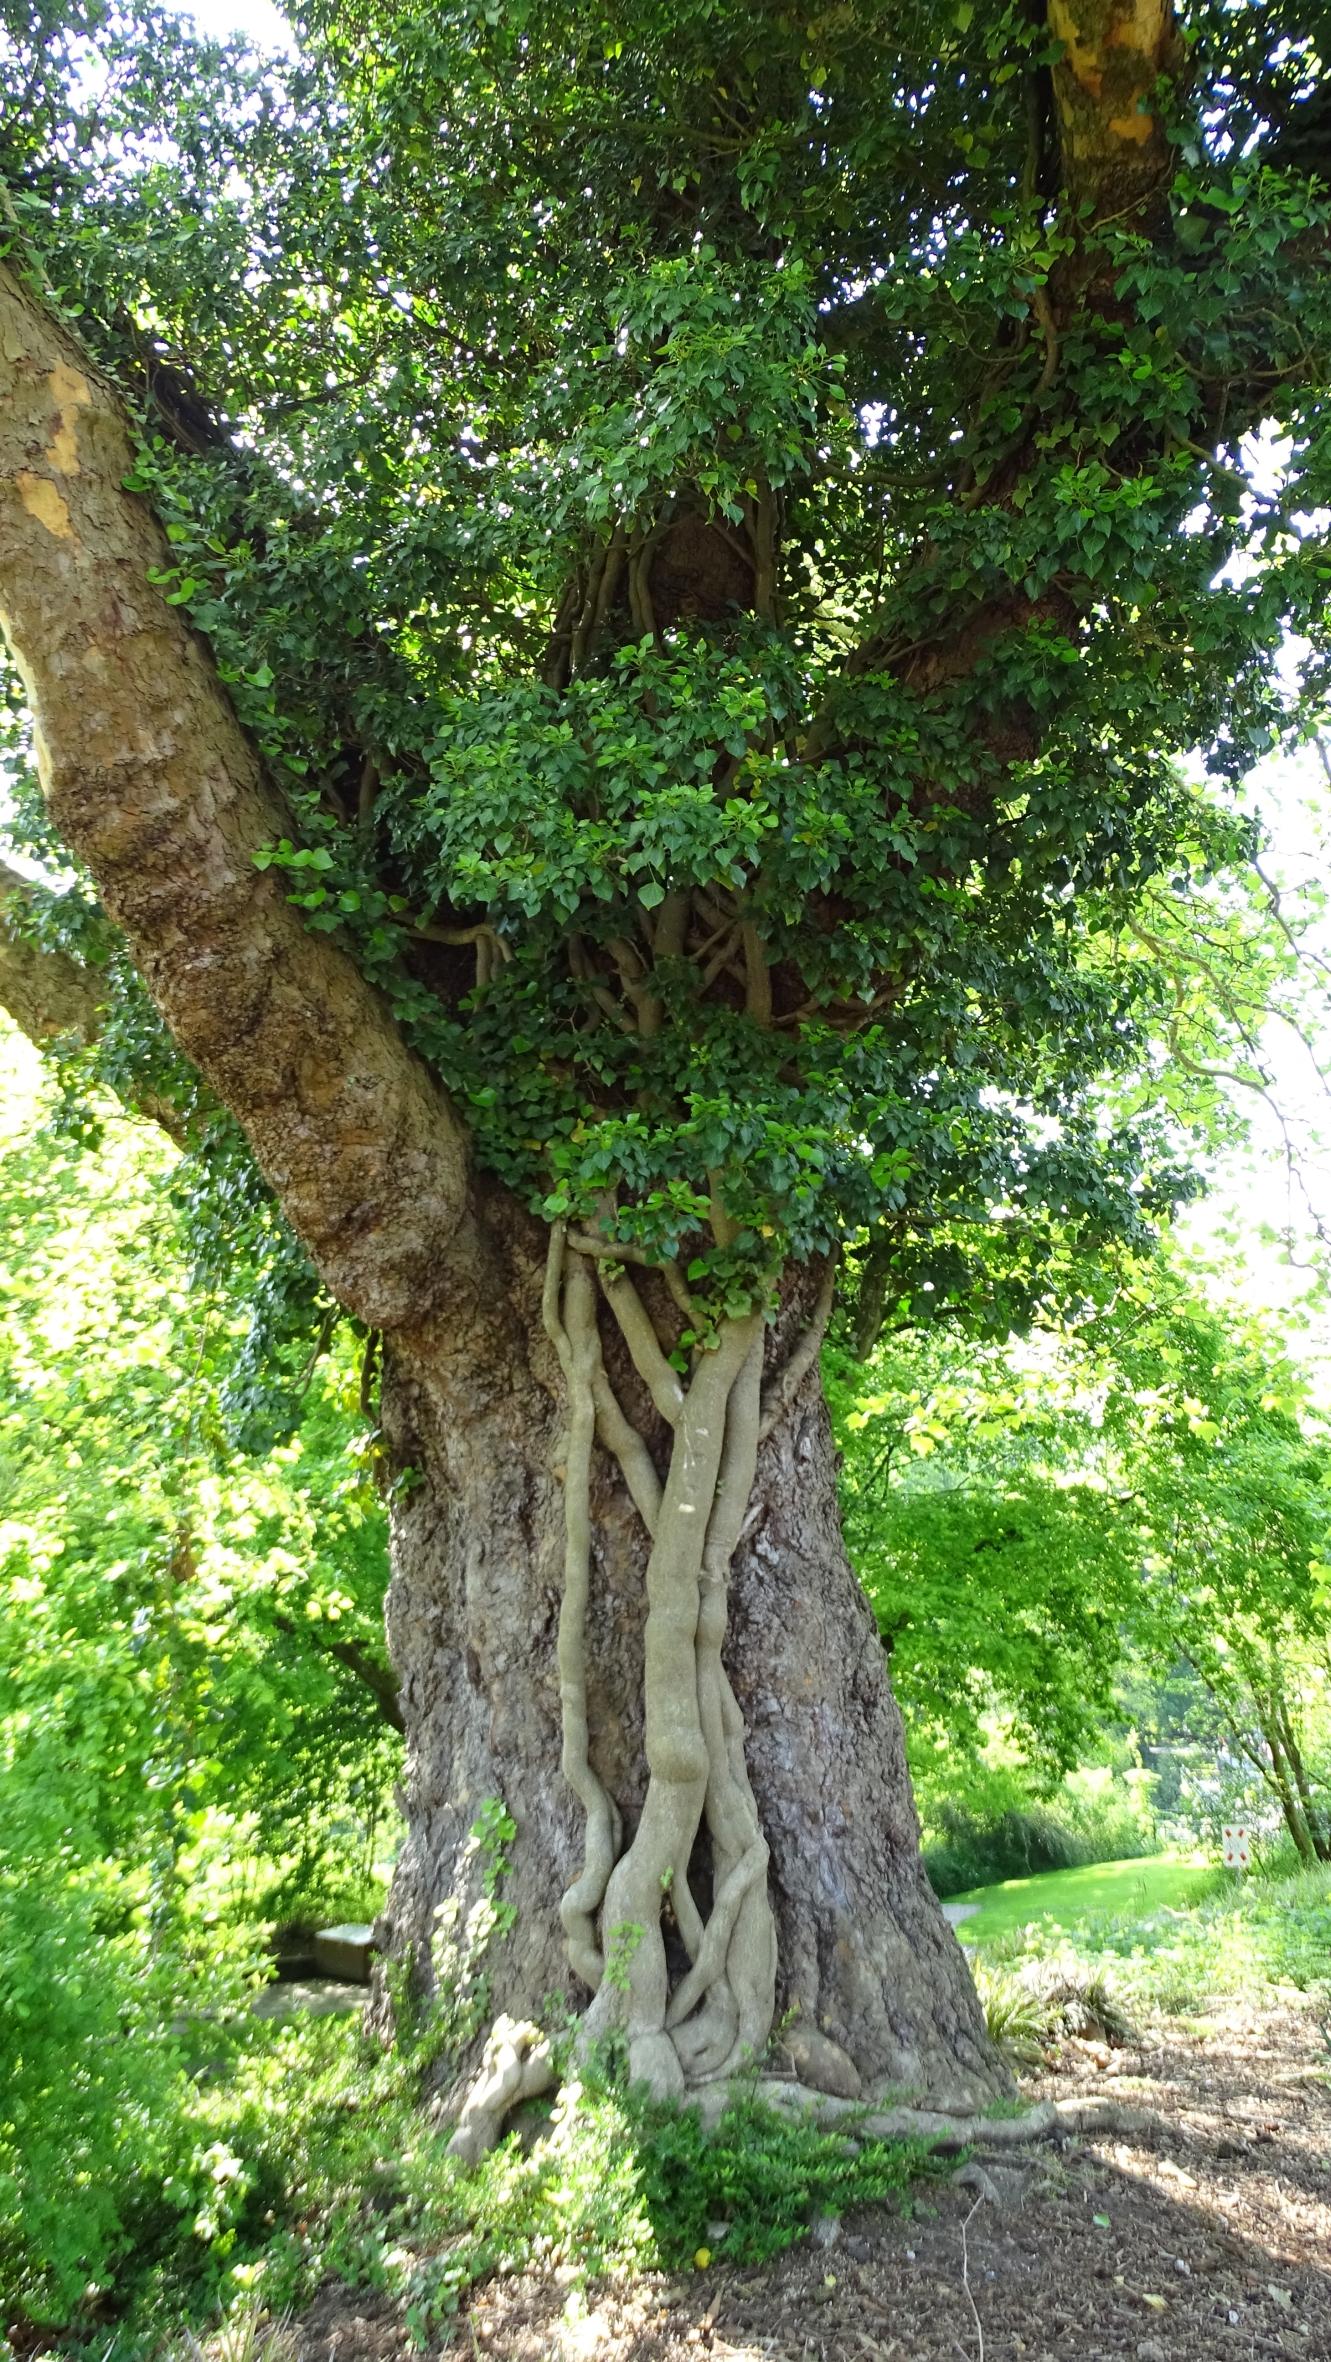 Baumbewuchs: Wann wird Efeu zum Problem?